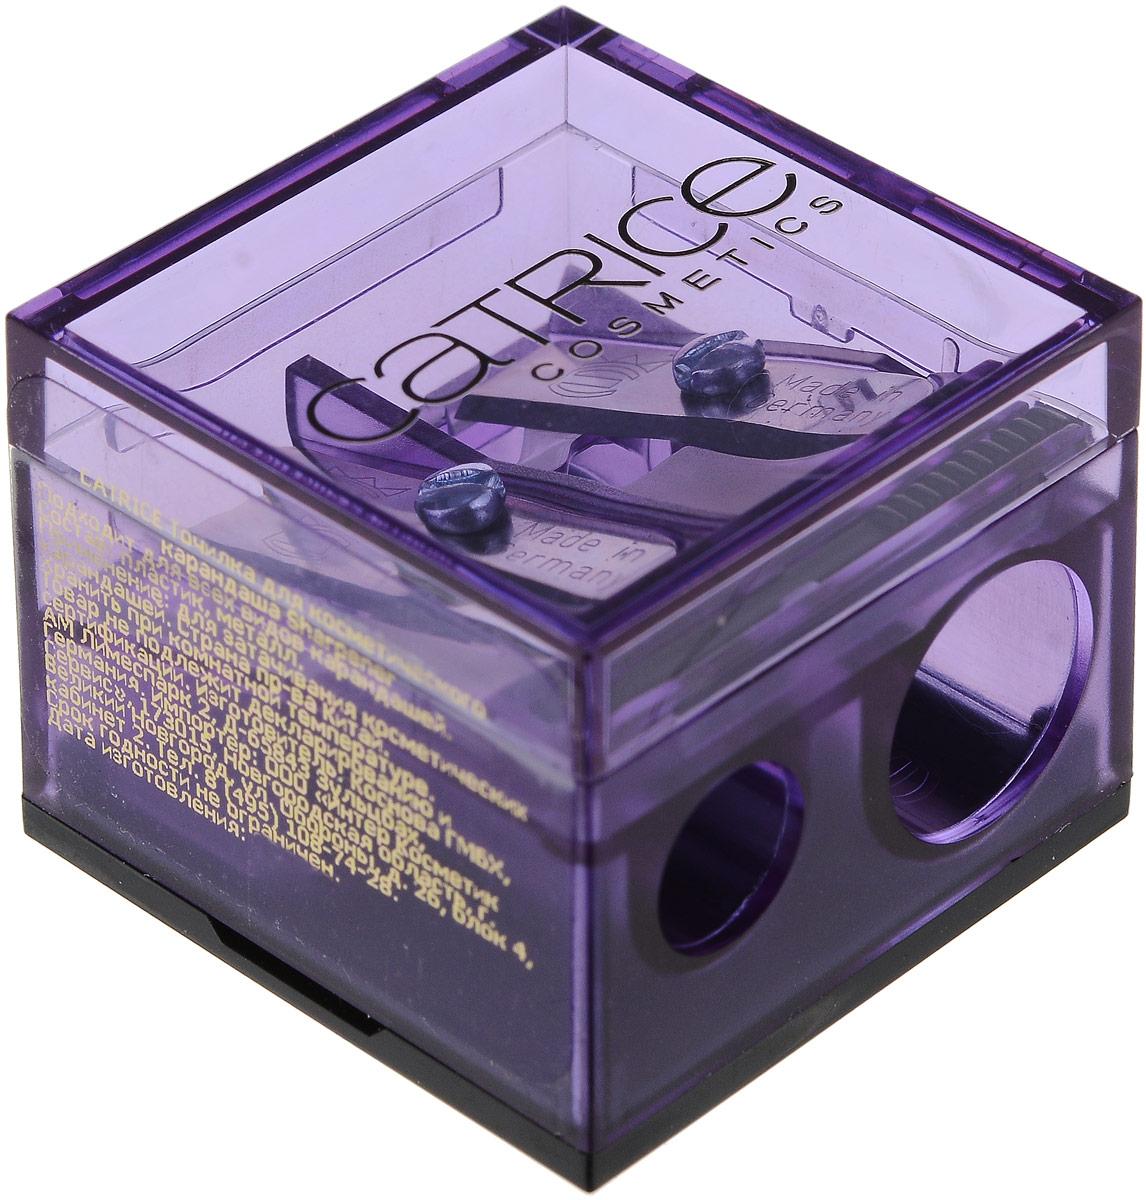 Catrice Точилка для косметического карандаша Sharpener 2 гр, цвет: фиолетовый электроточило work sharp knife & tool sharpener wskts i